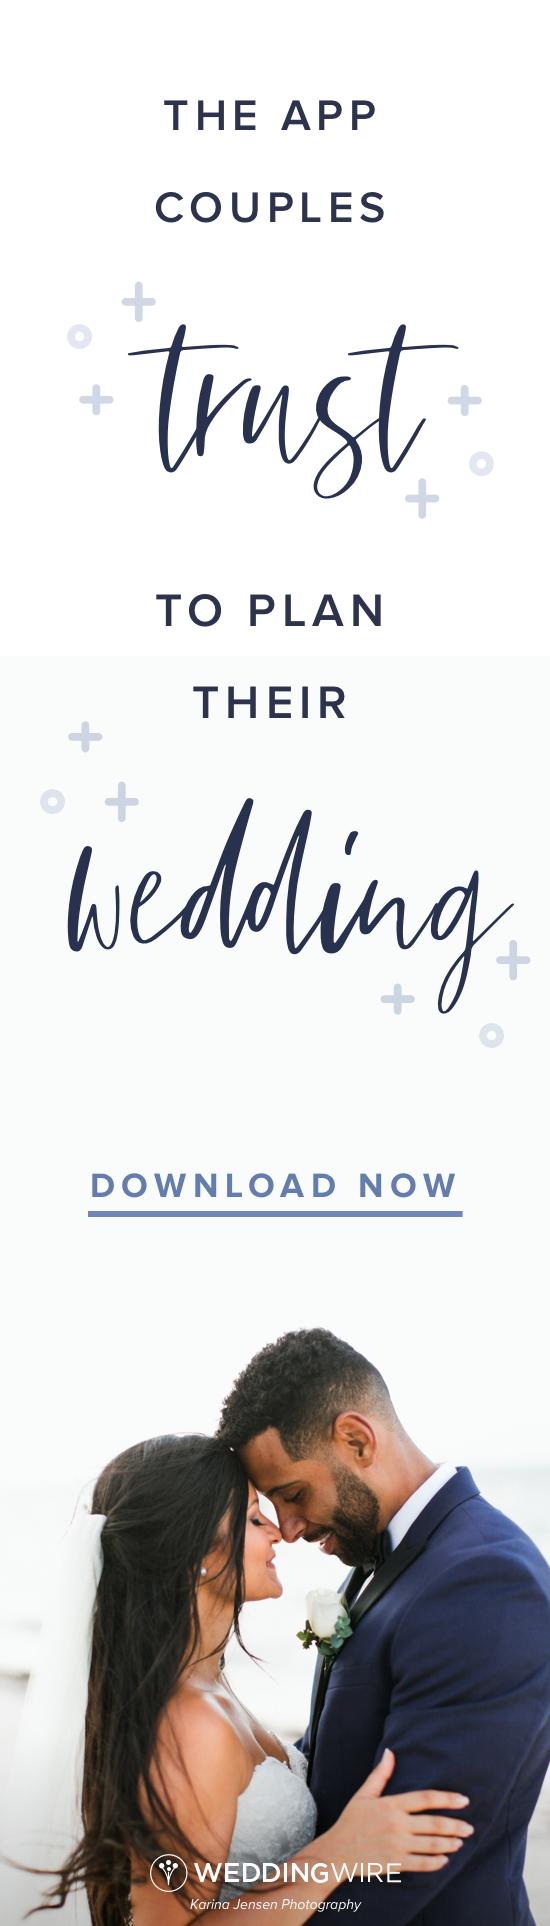 Get the FREE Wedding Planning App! It\'s got a checklist, budget ...